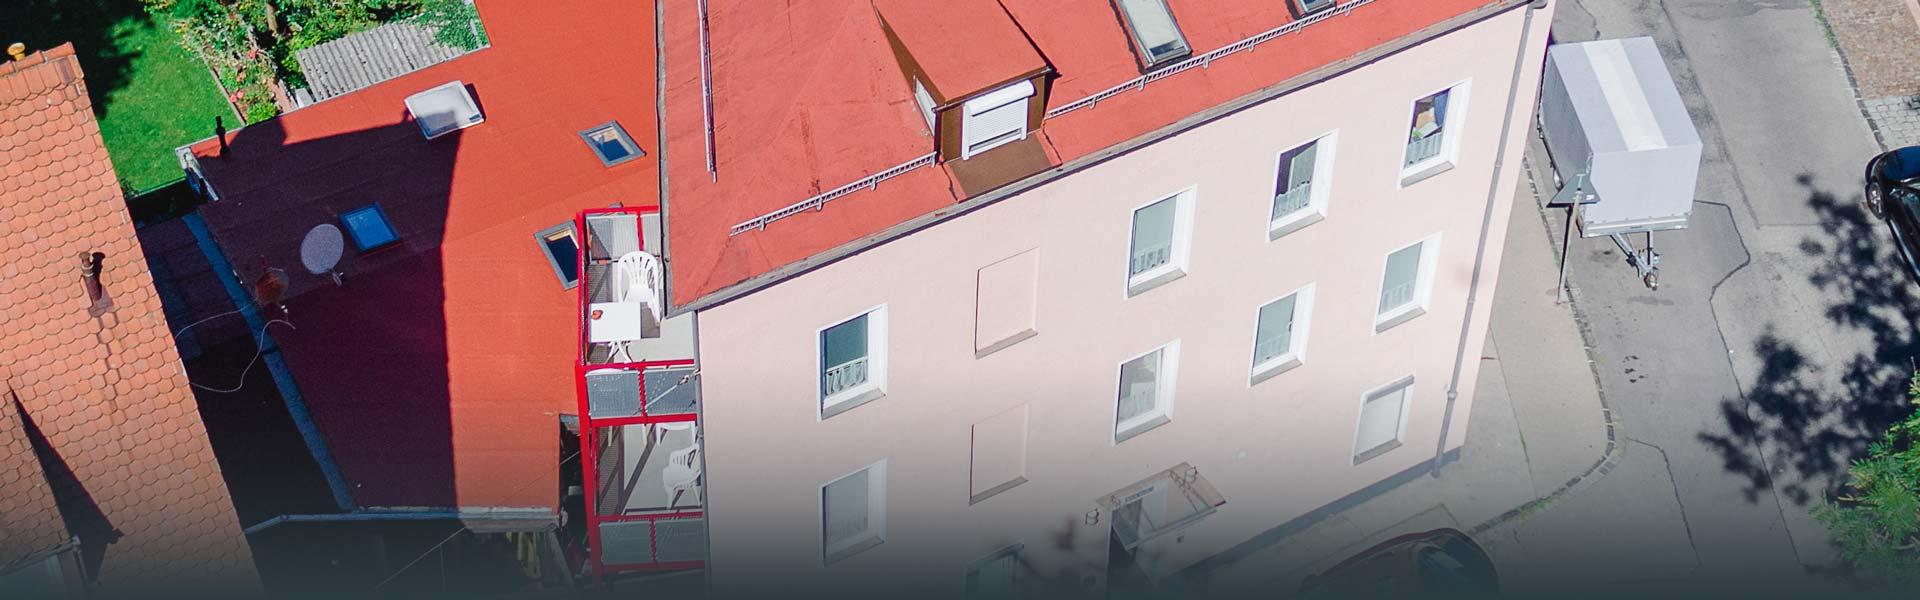 Cityapartment-mit-Balkon-AugsburgLiving